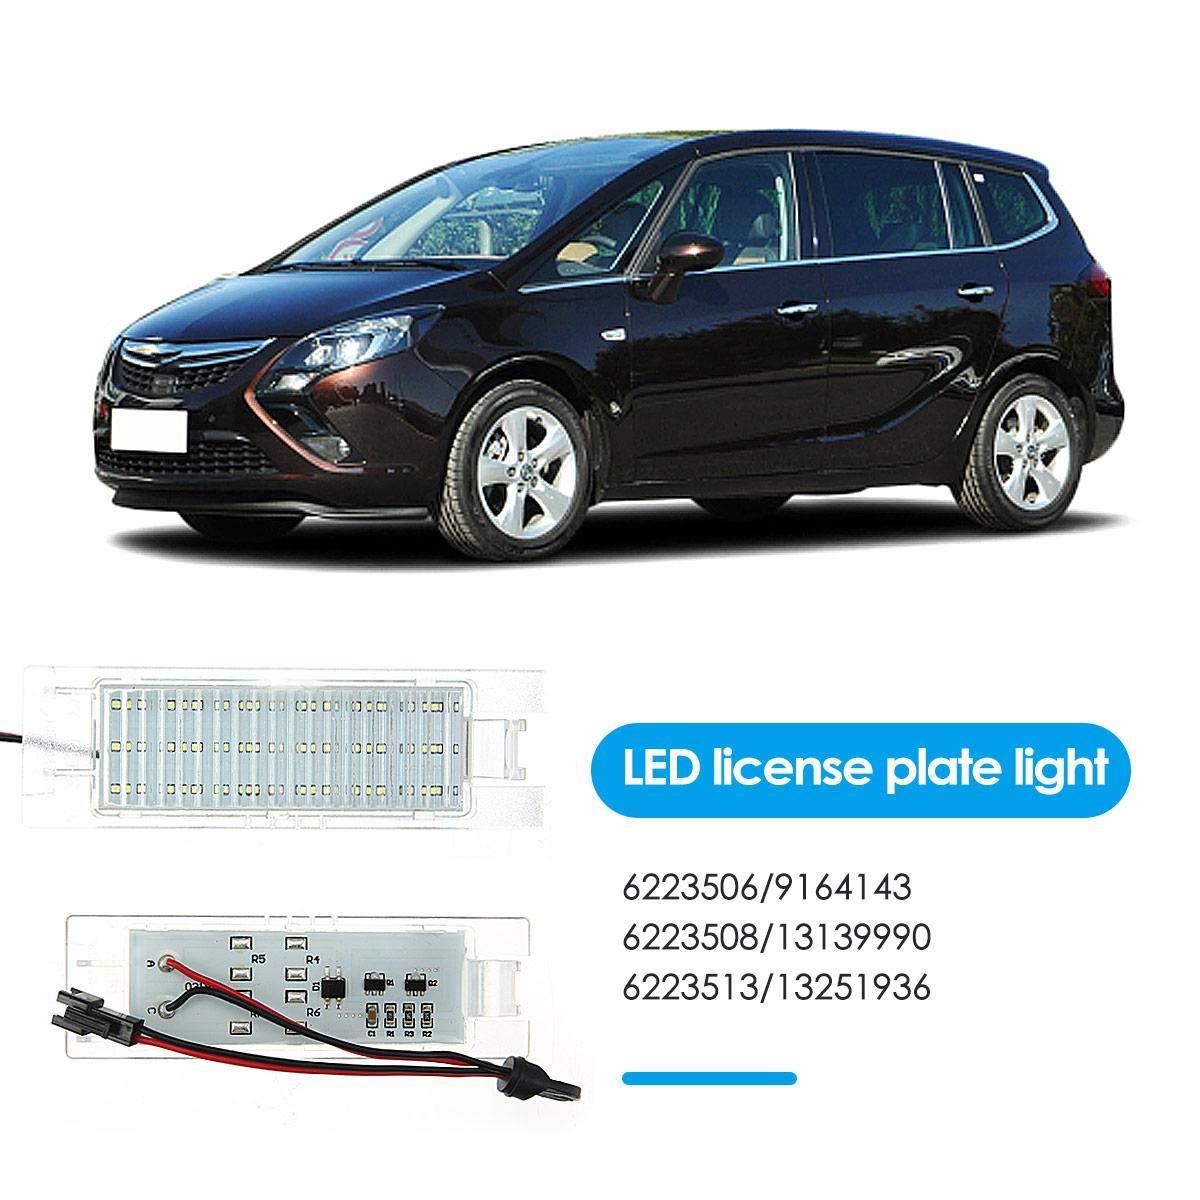 License Plate Lamp For Opel Zafira Astra H Corsa D Insignia Corsa DokFin 2 PCS LED Car License Plate Lights C Meriva-A Tigra-B Vectra-C Astra-J